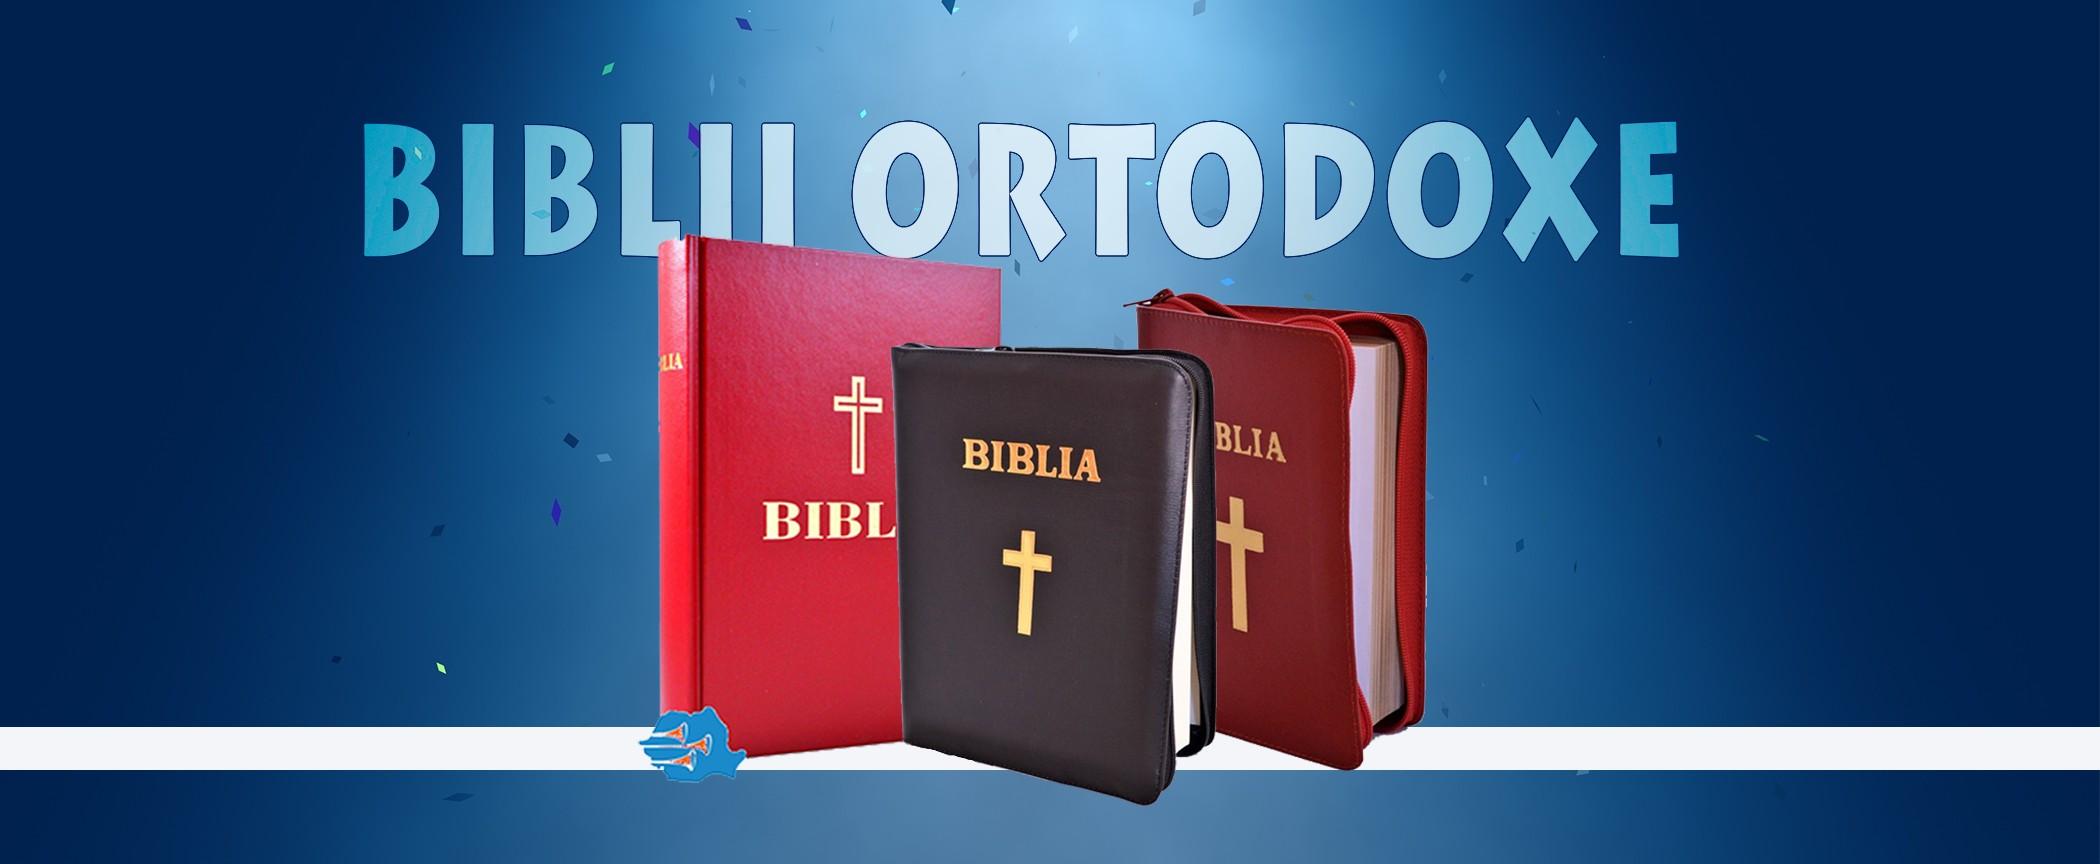 Biblia Ortodoxa